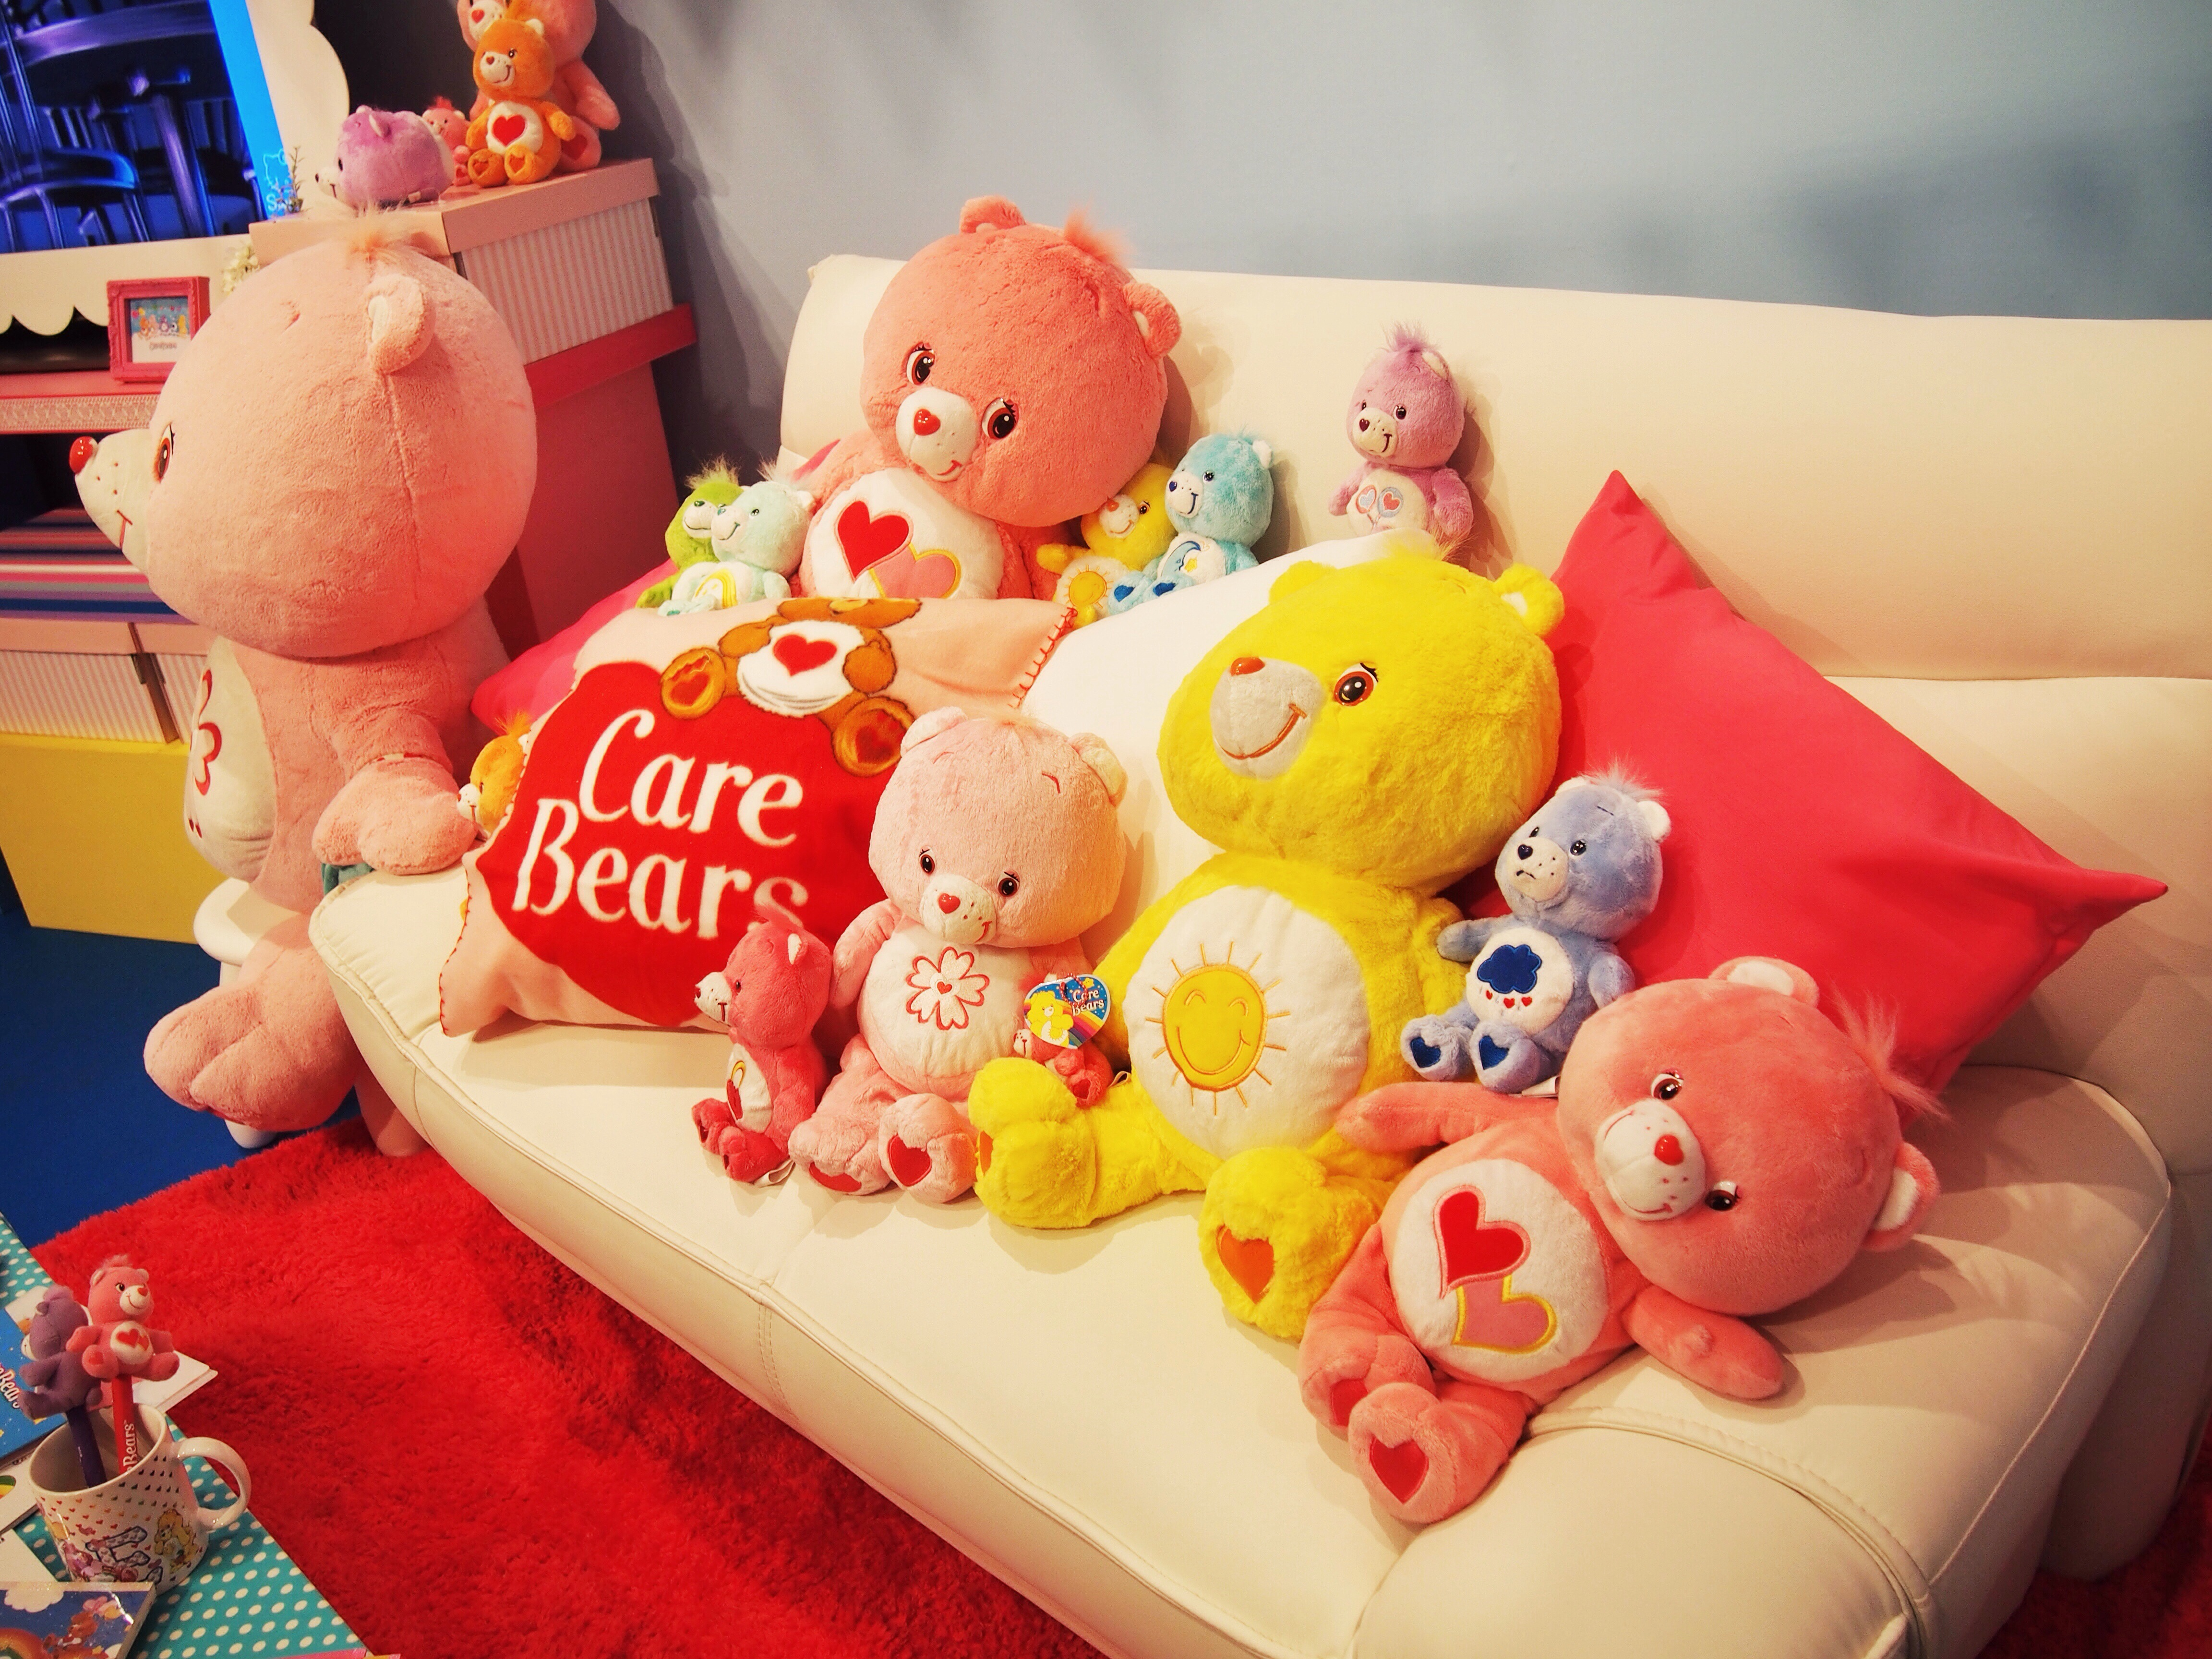 Little Twin Stars X Care Bears